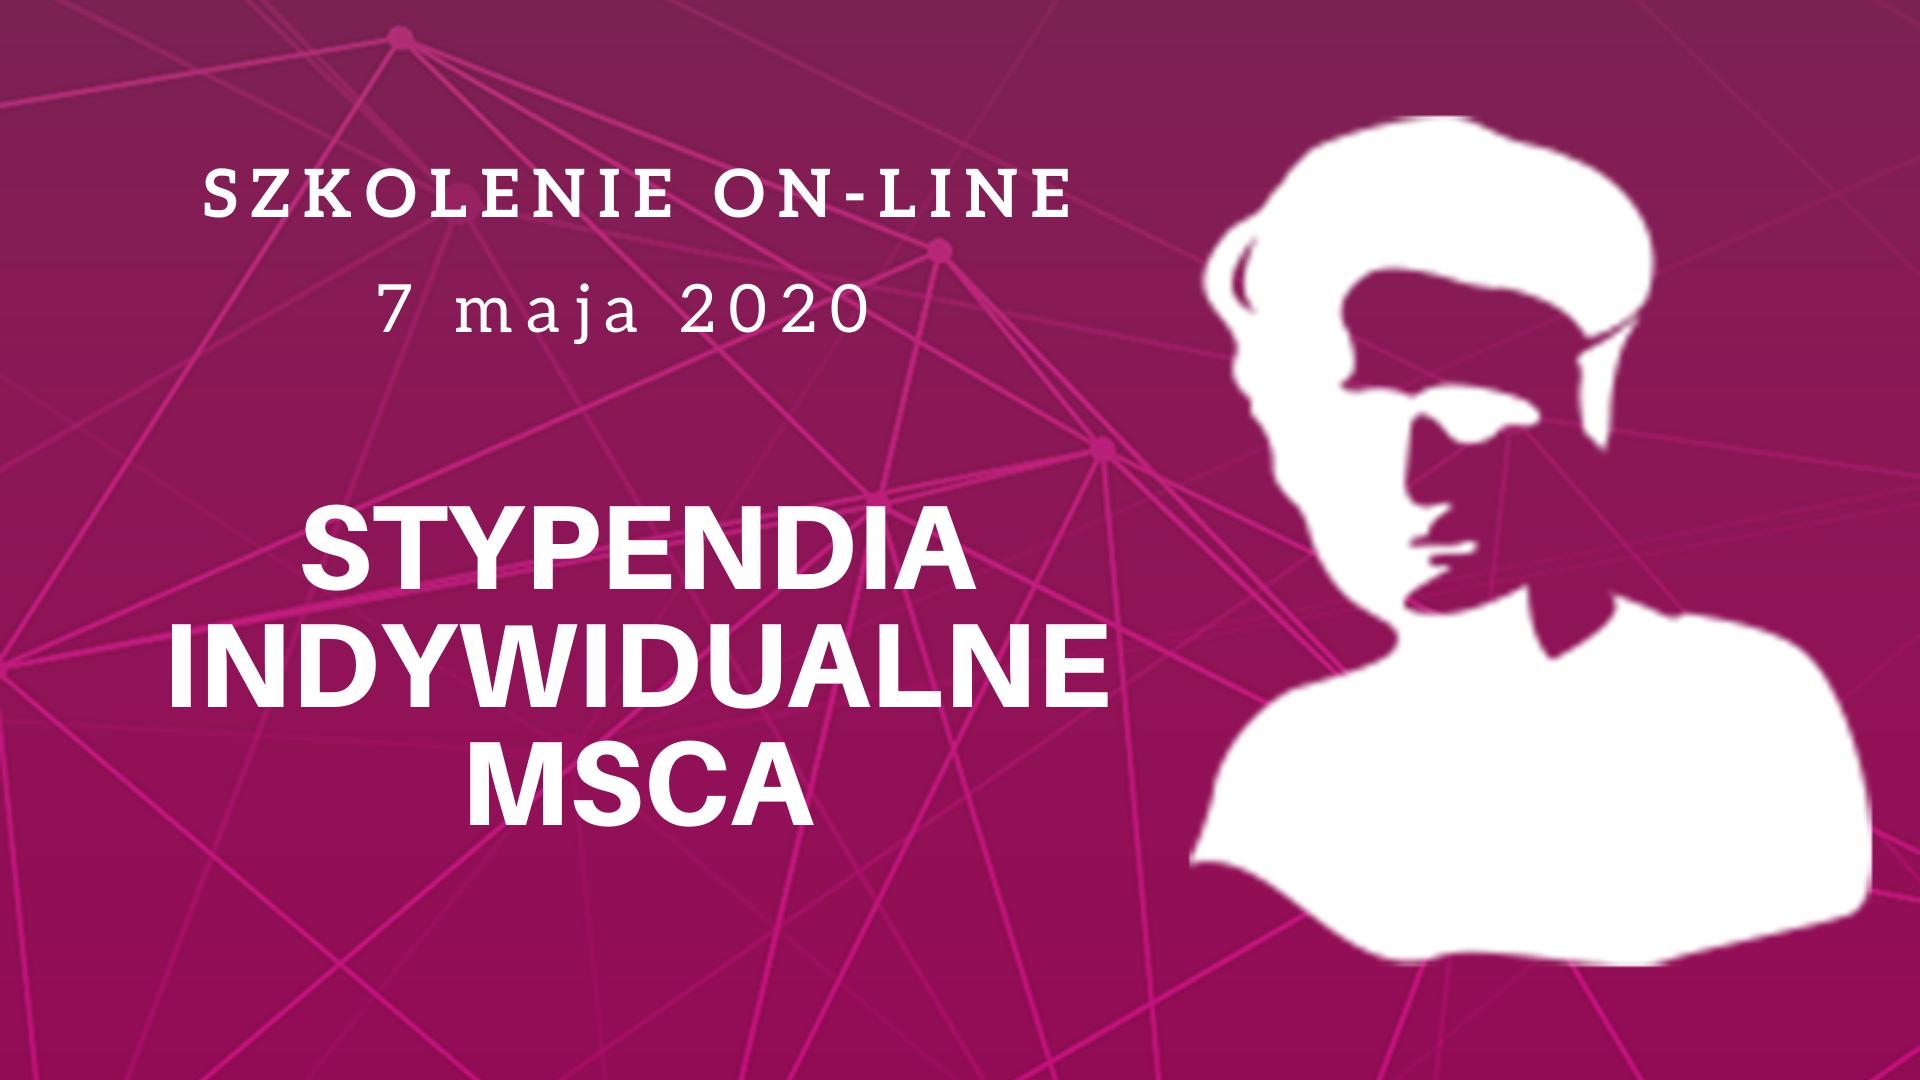 Stypendia Indywidualne MSCA (2).png